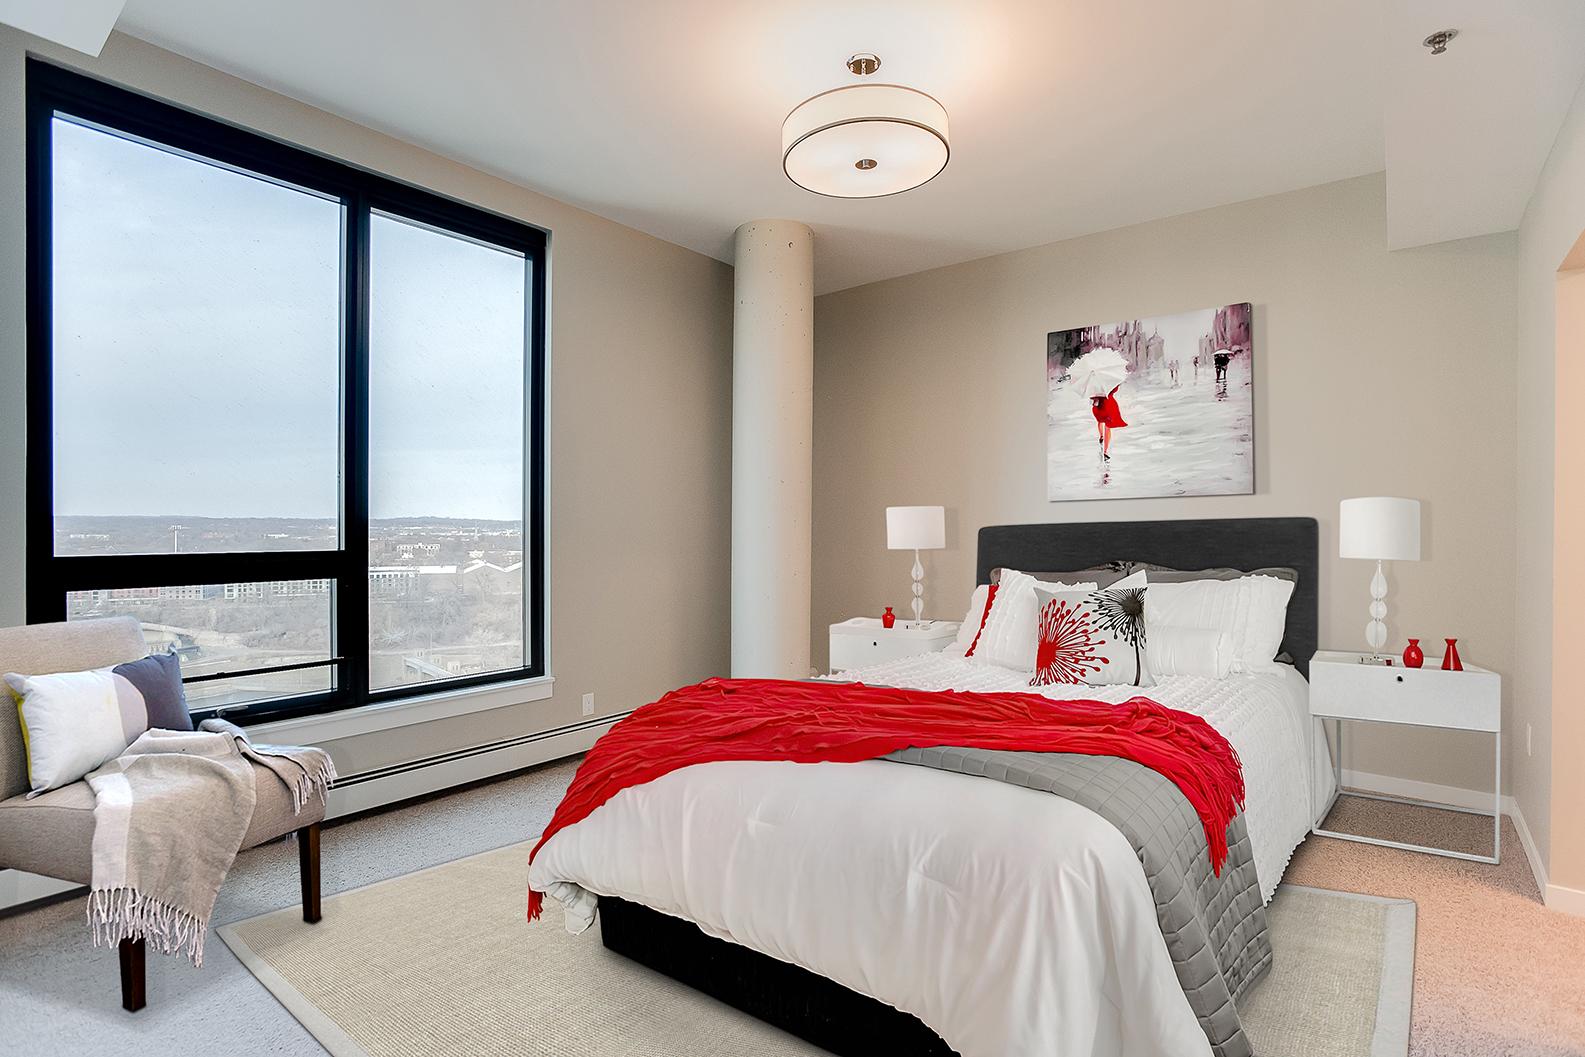 Minneapolis Condos for Sale - Legacy Unit 1324